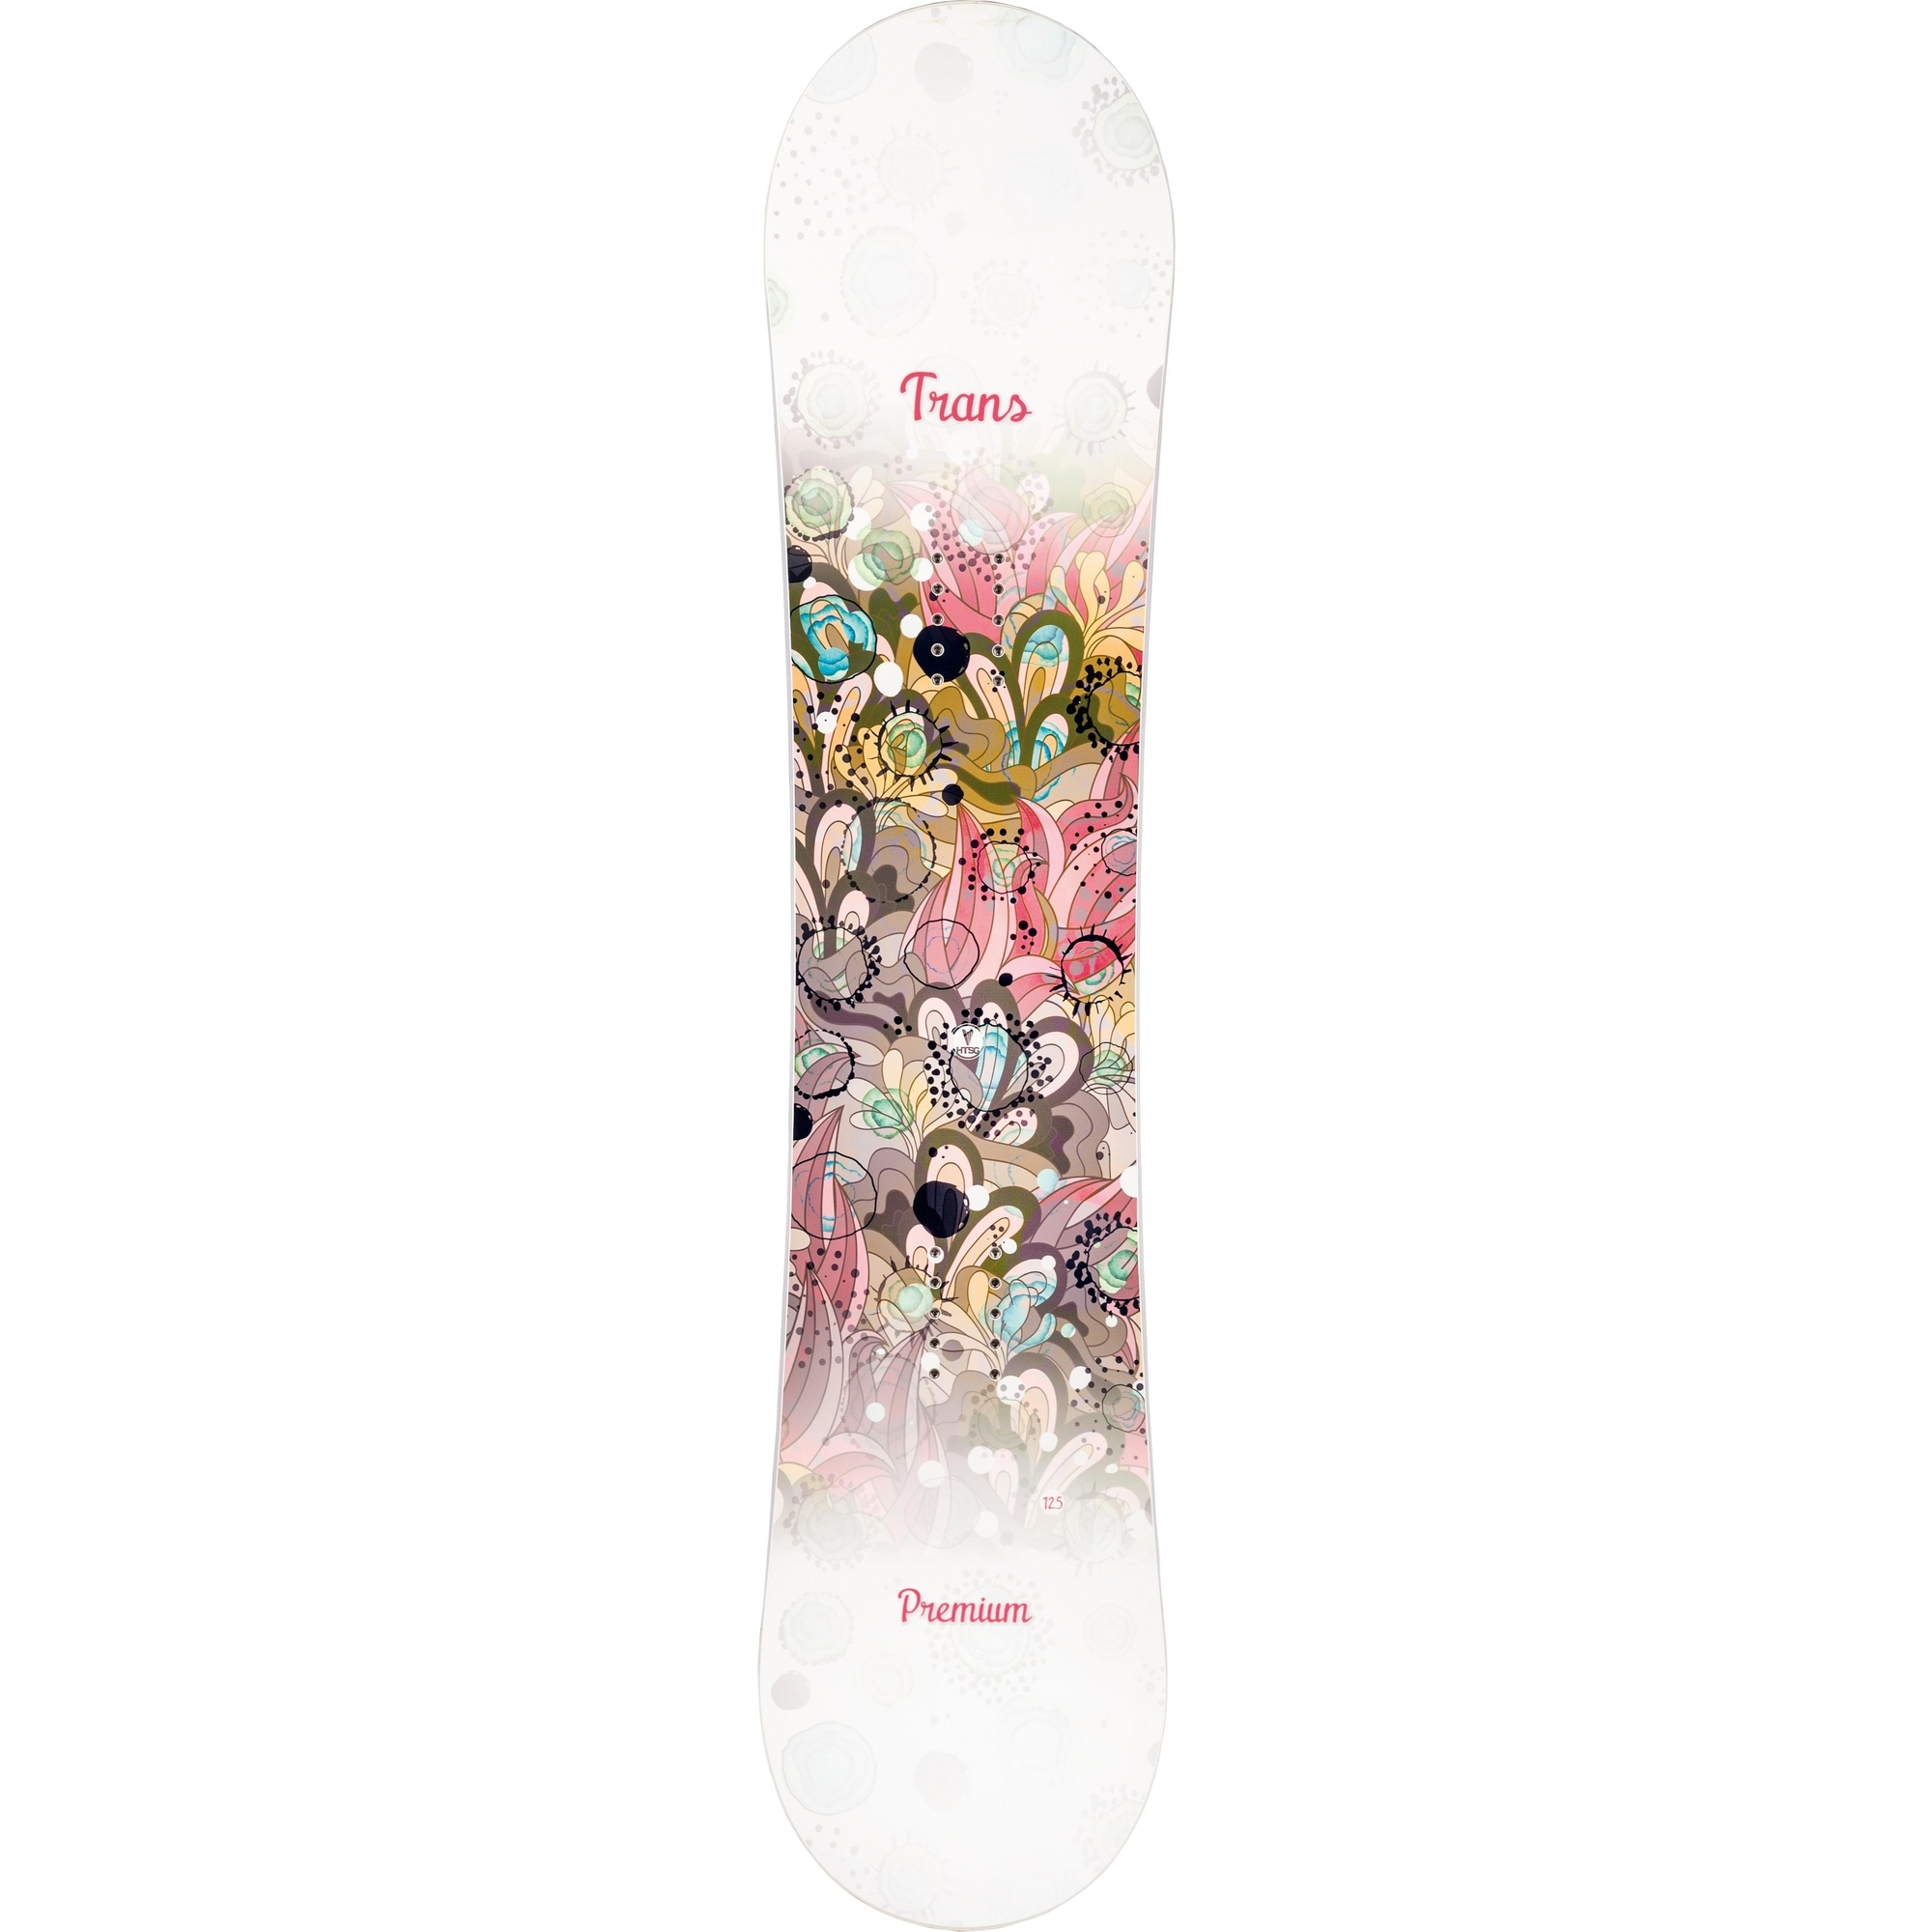 Placa snowboard copii Trans Premium JR Fullrocker Alb 2019 imagine